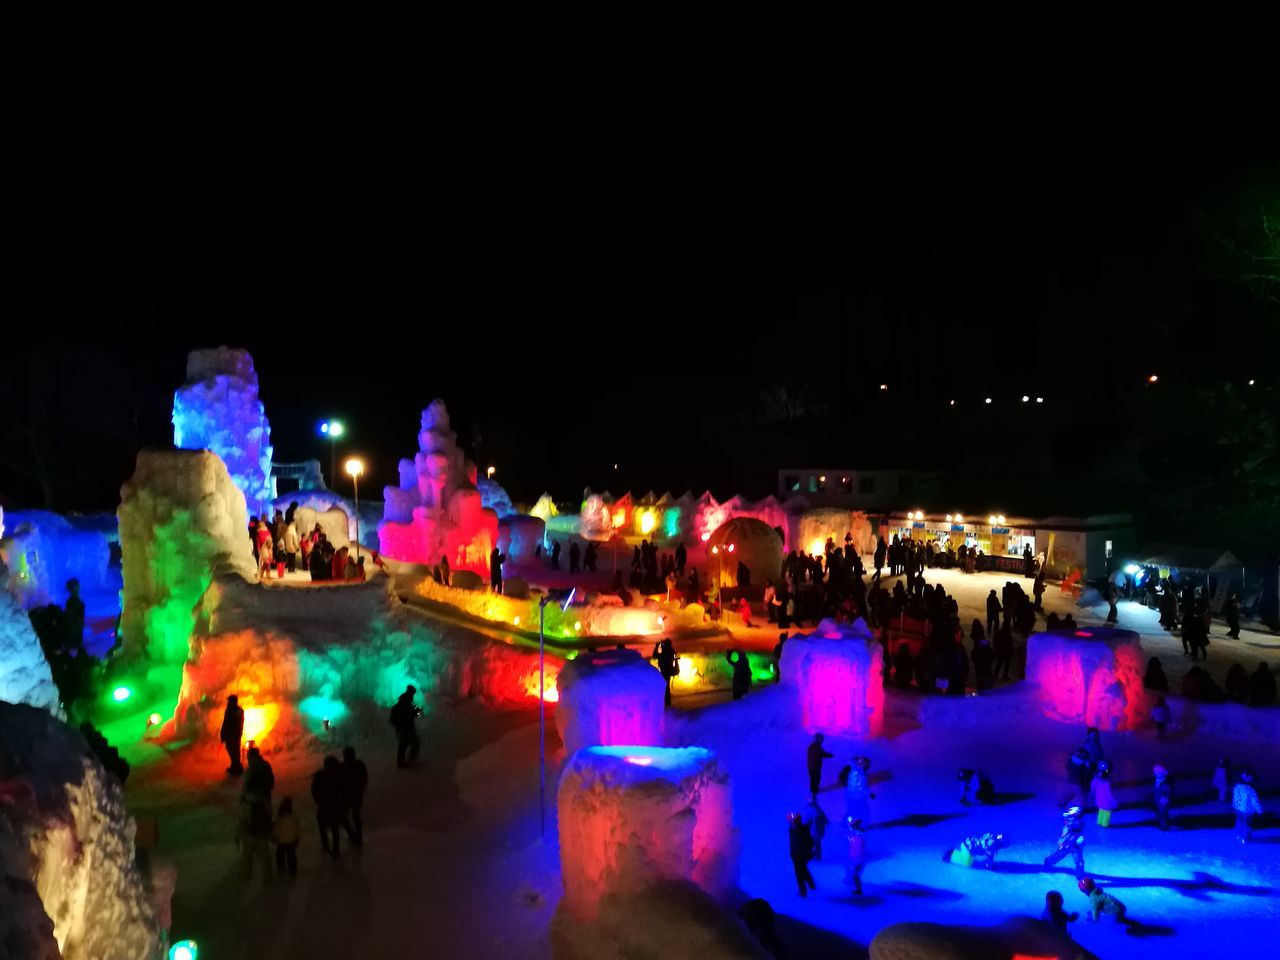 Night Illuminated Travel Destinations Large Group Of People Enjoyment Hokkaido,Japan Snow ❄ Shikotsuko Sapporo,Hokkaido,Japan shikotsuko Shikotsu Lake